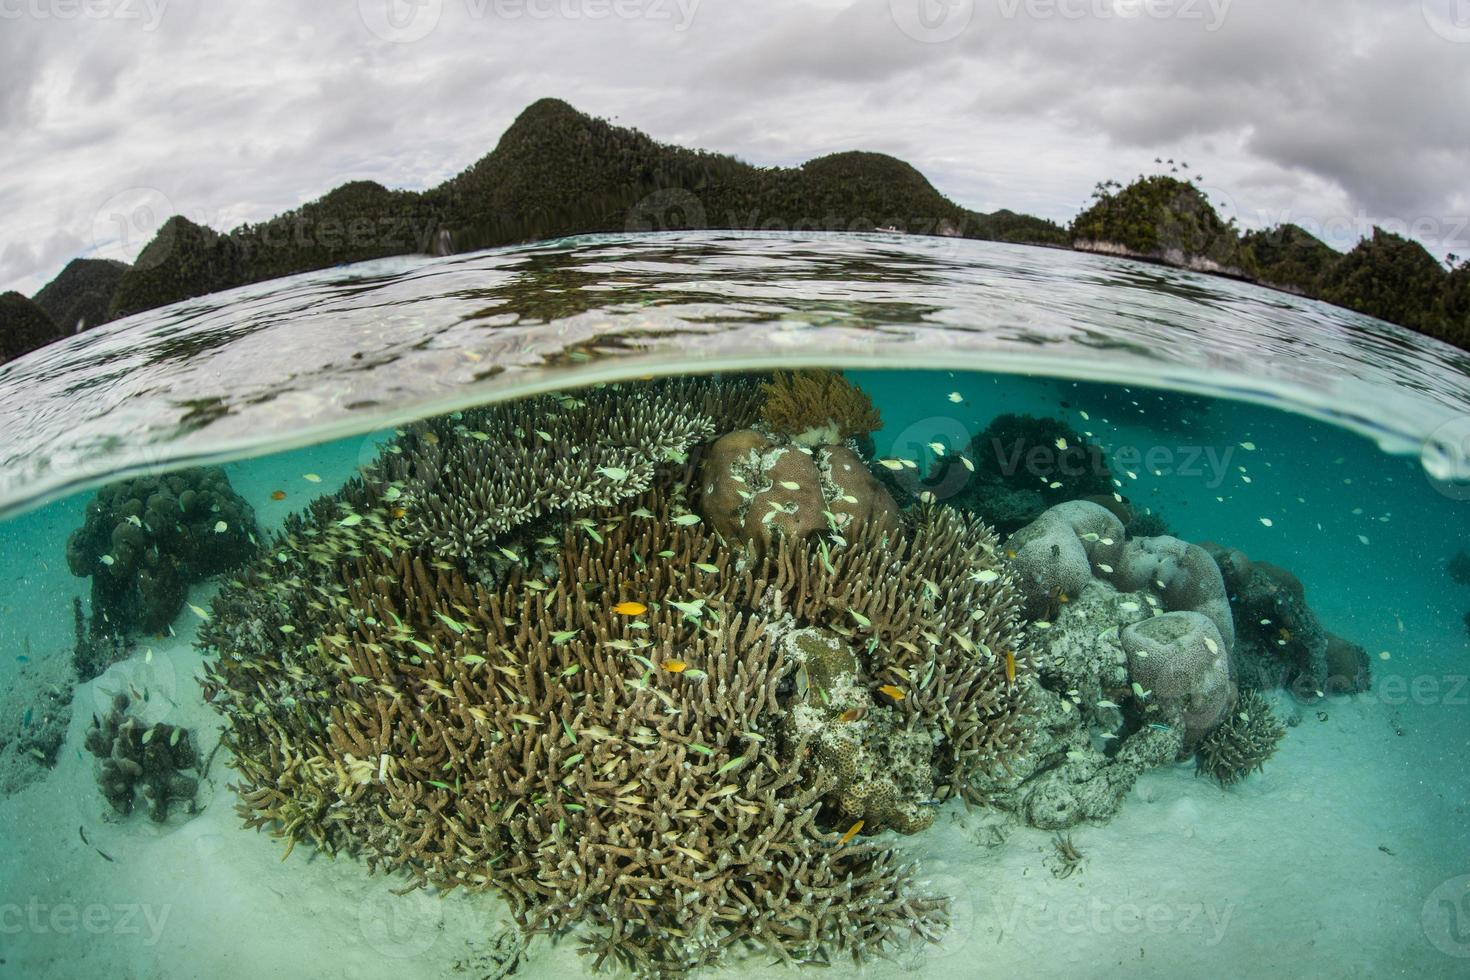 korallrev i lagunen foto